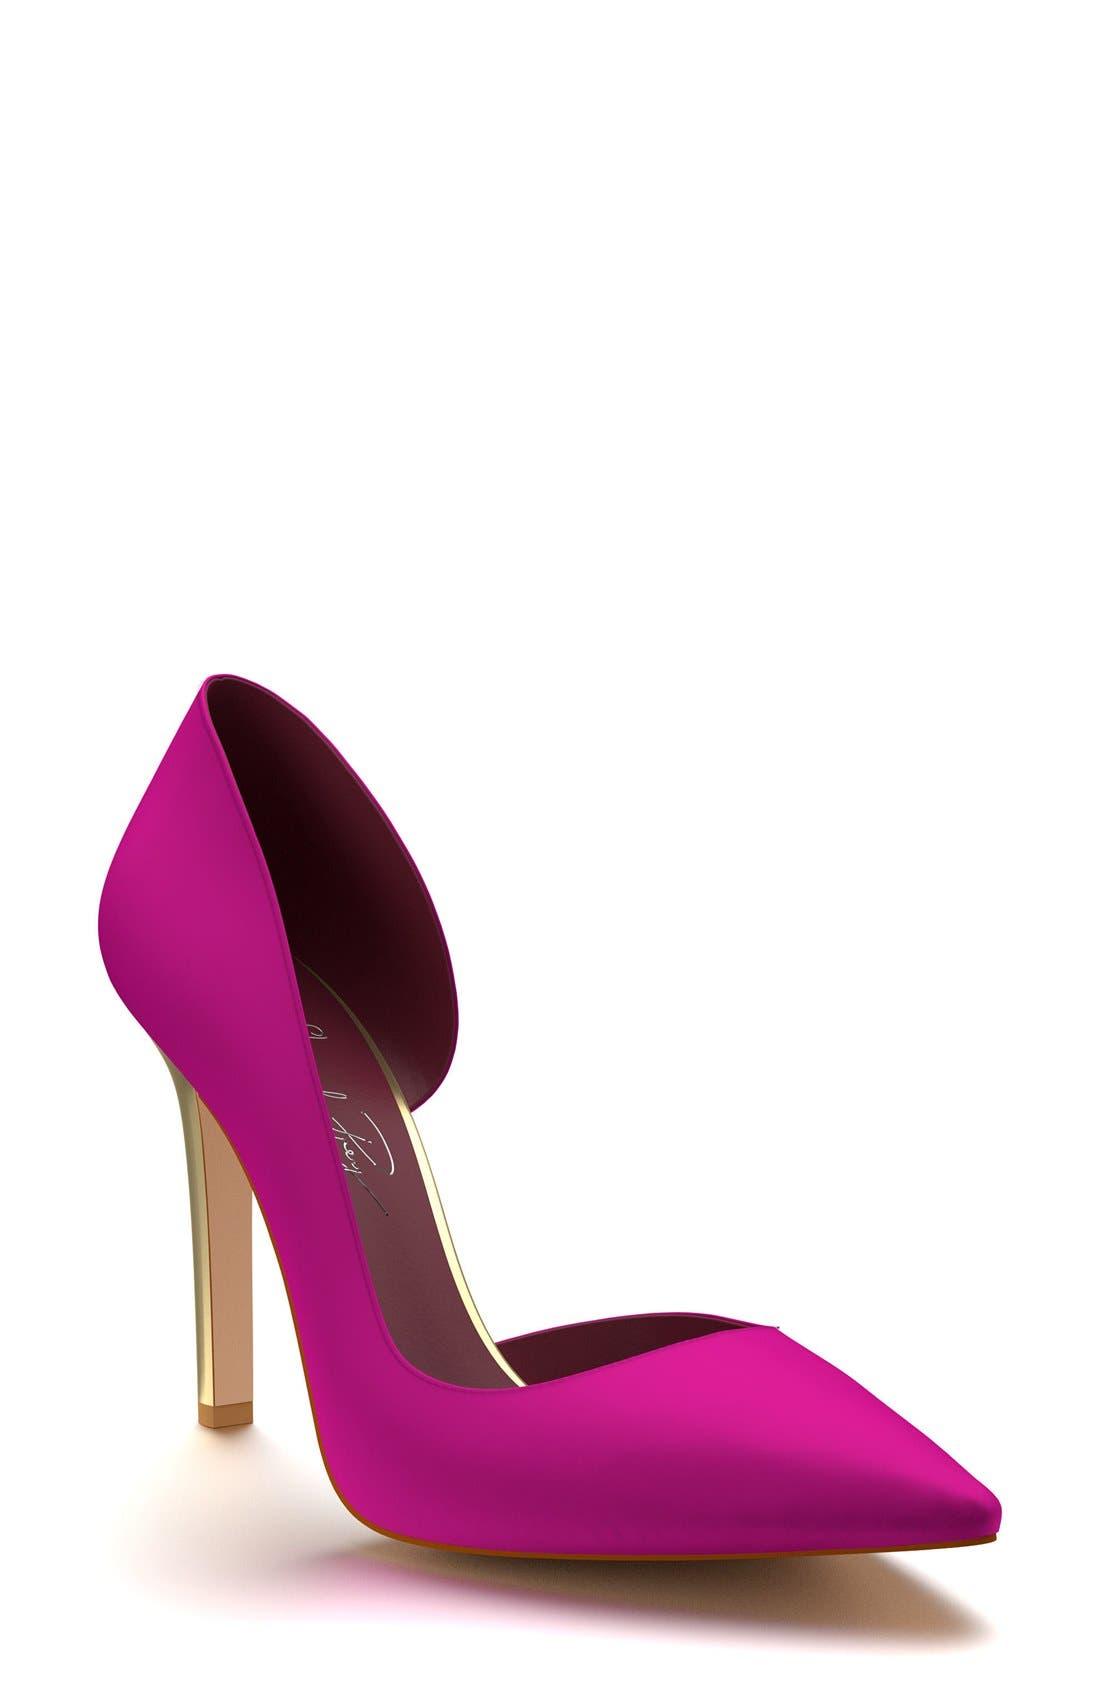 Main Image - Shoes of Prey Pointy Toe Half d'Orsay Pump (Women)